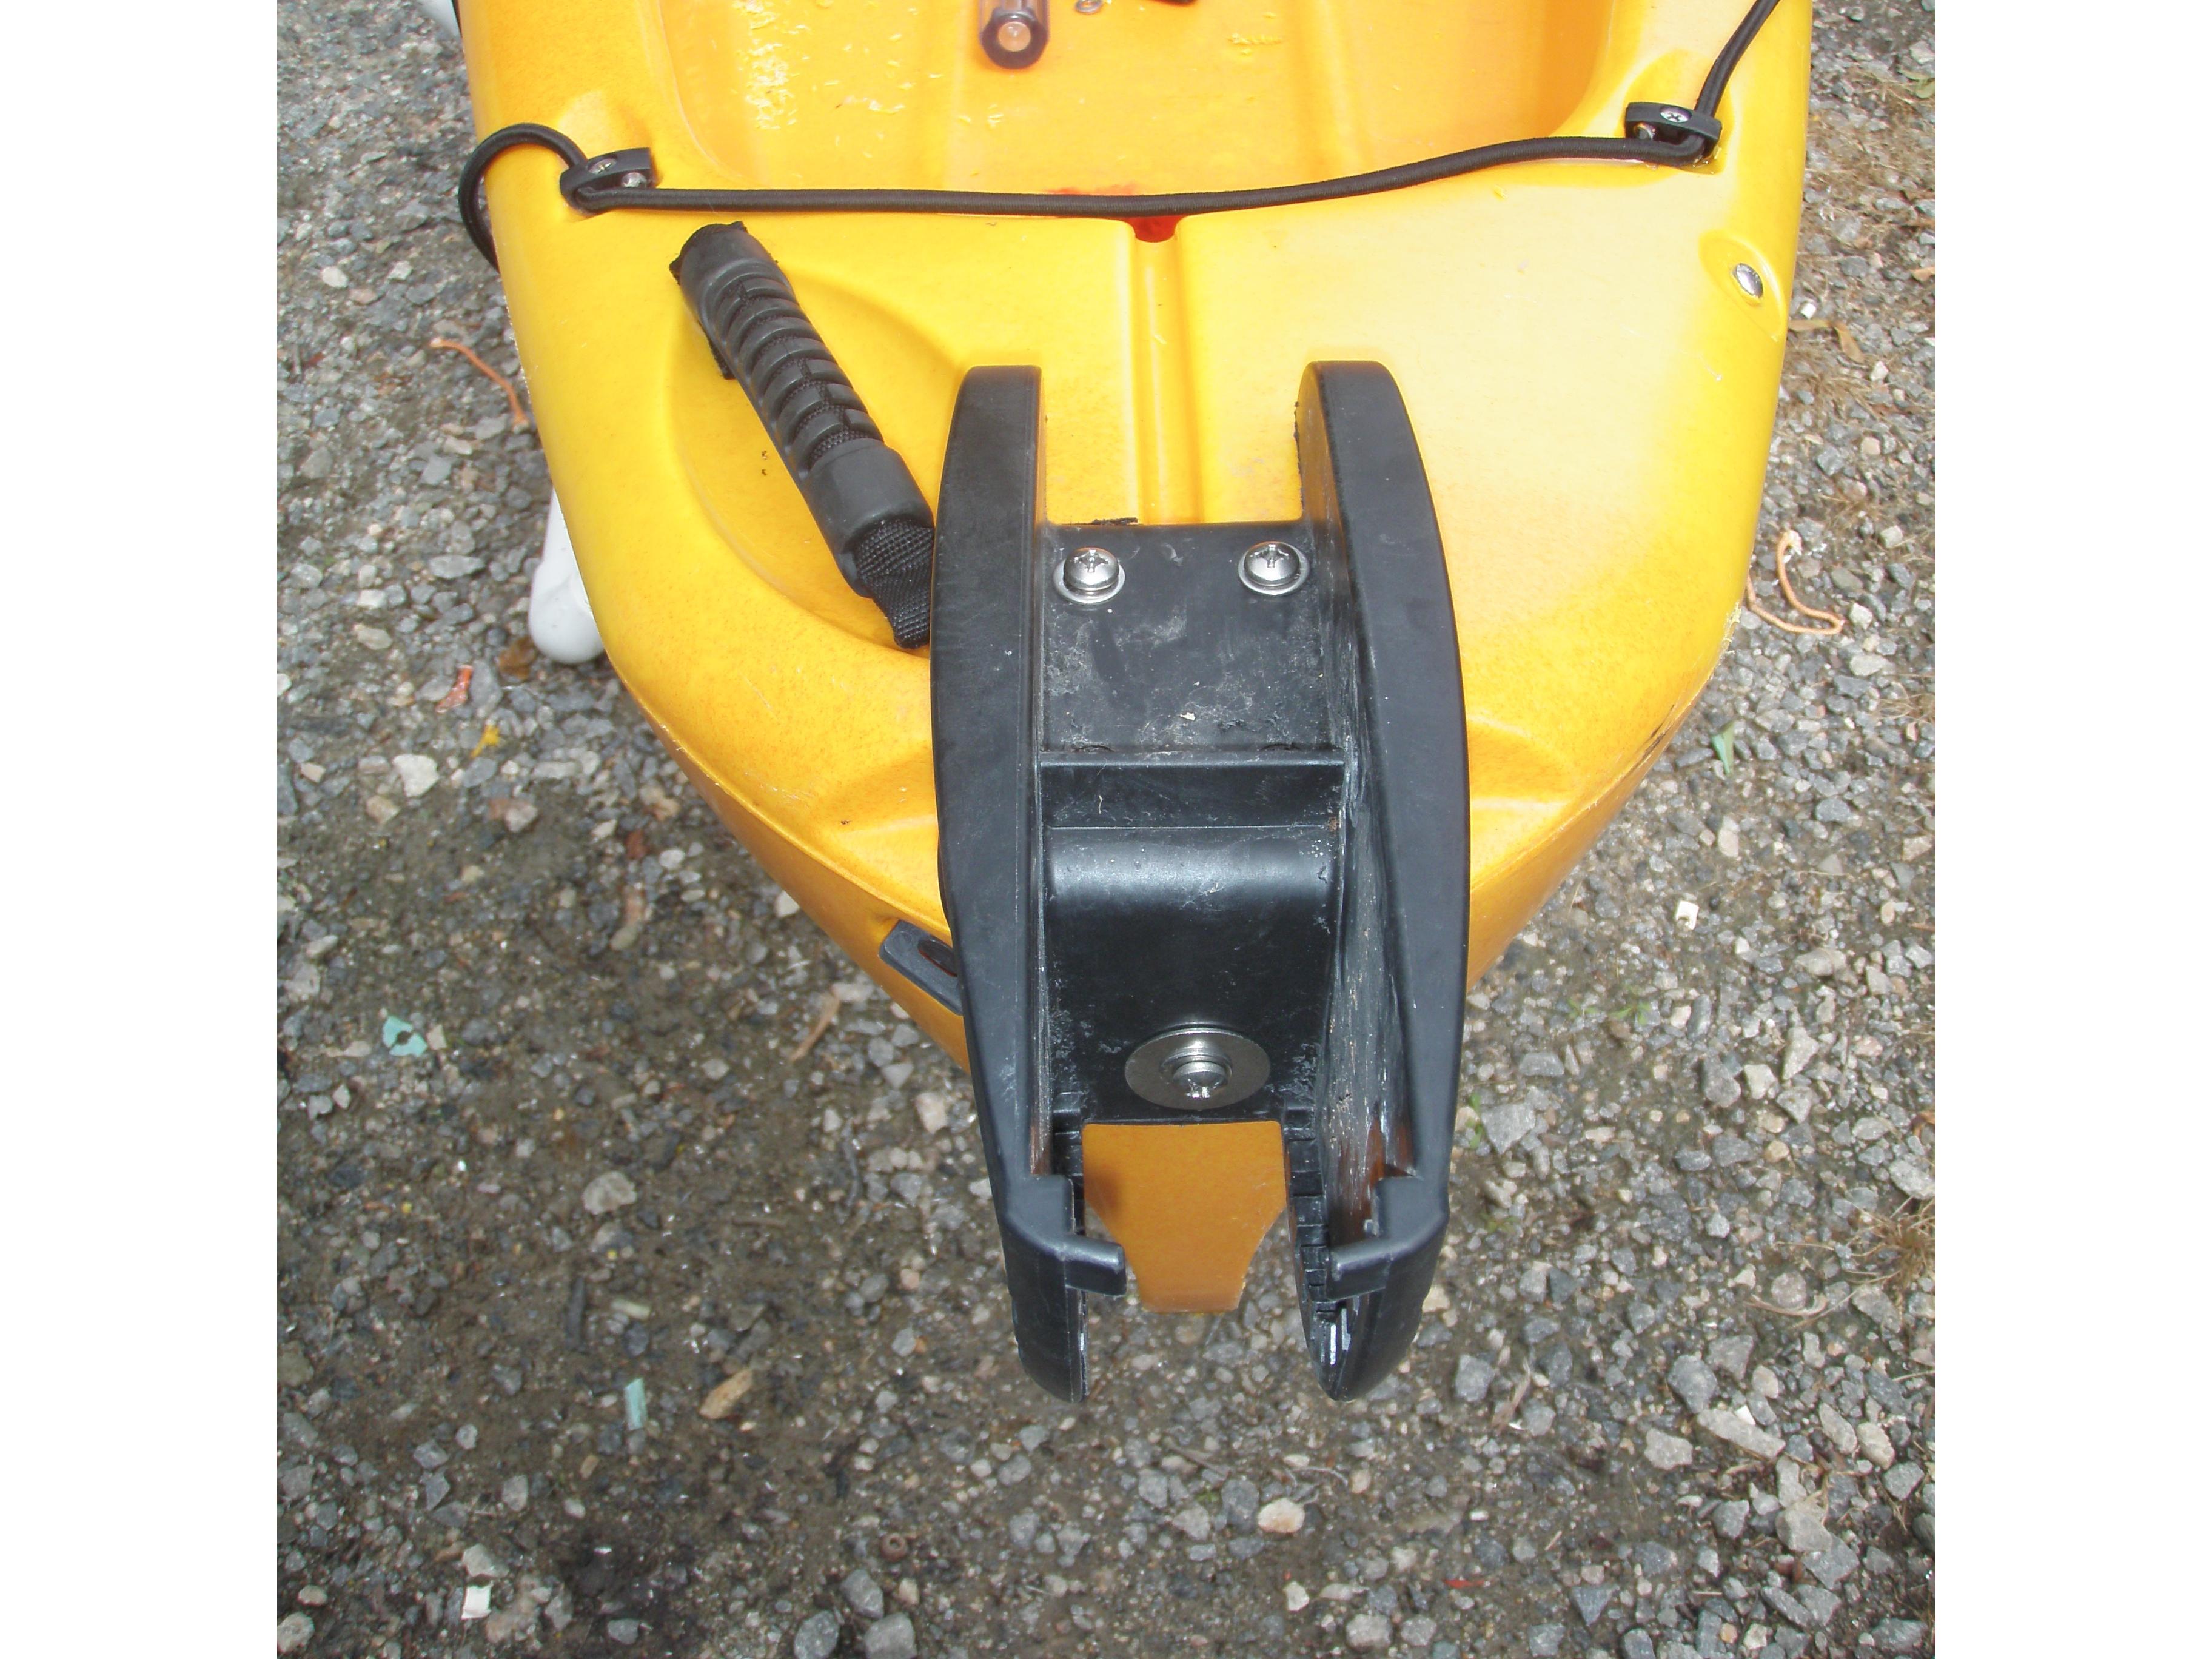 Mount For Trolling Motor For Kayak